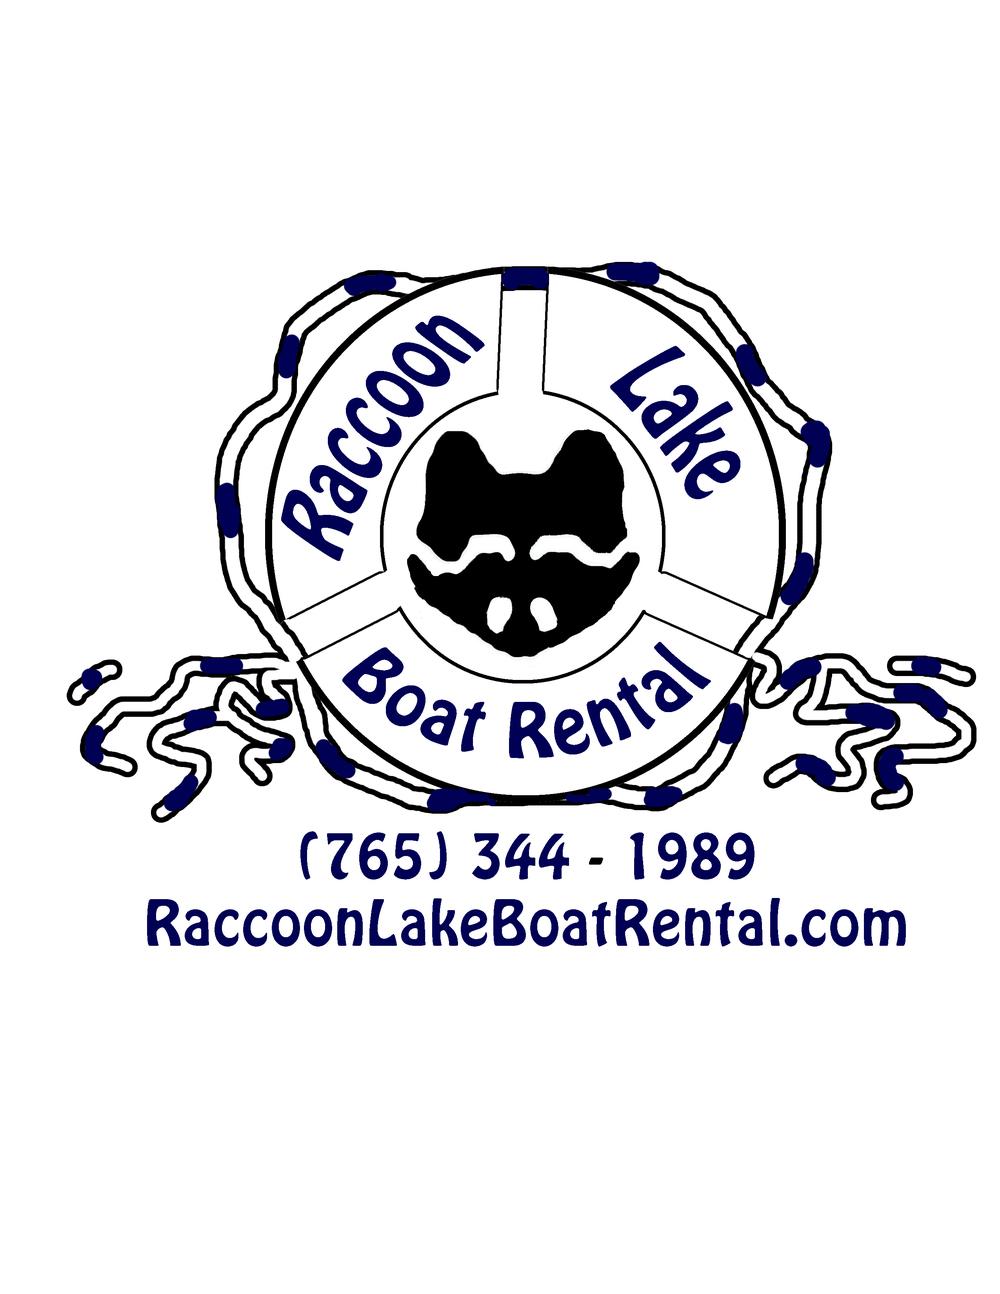 RLBR logo 2015.jpg